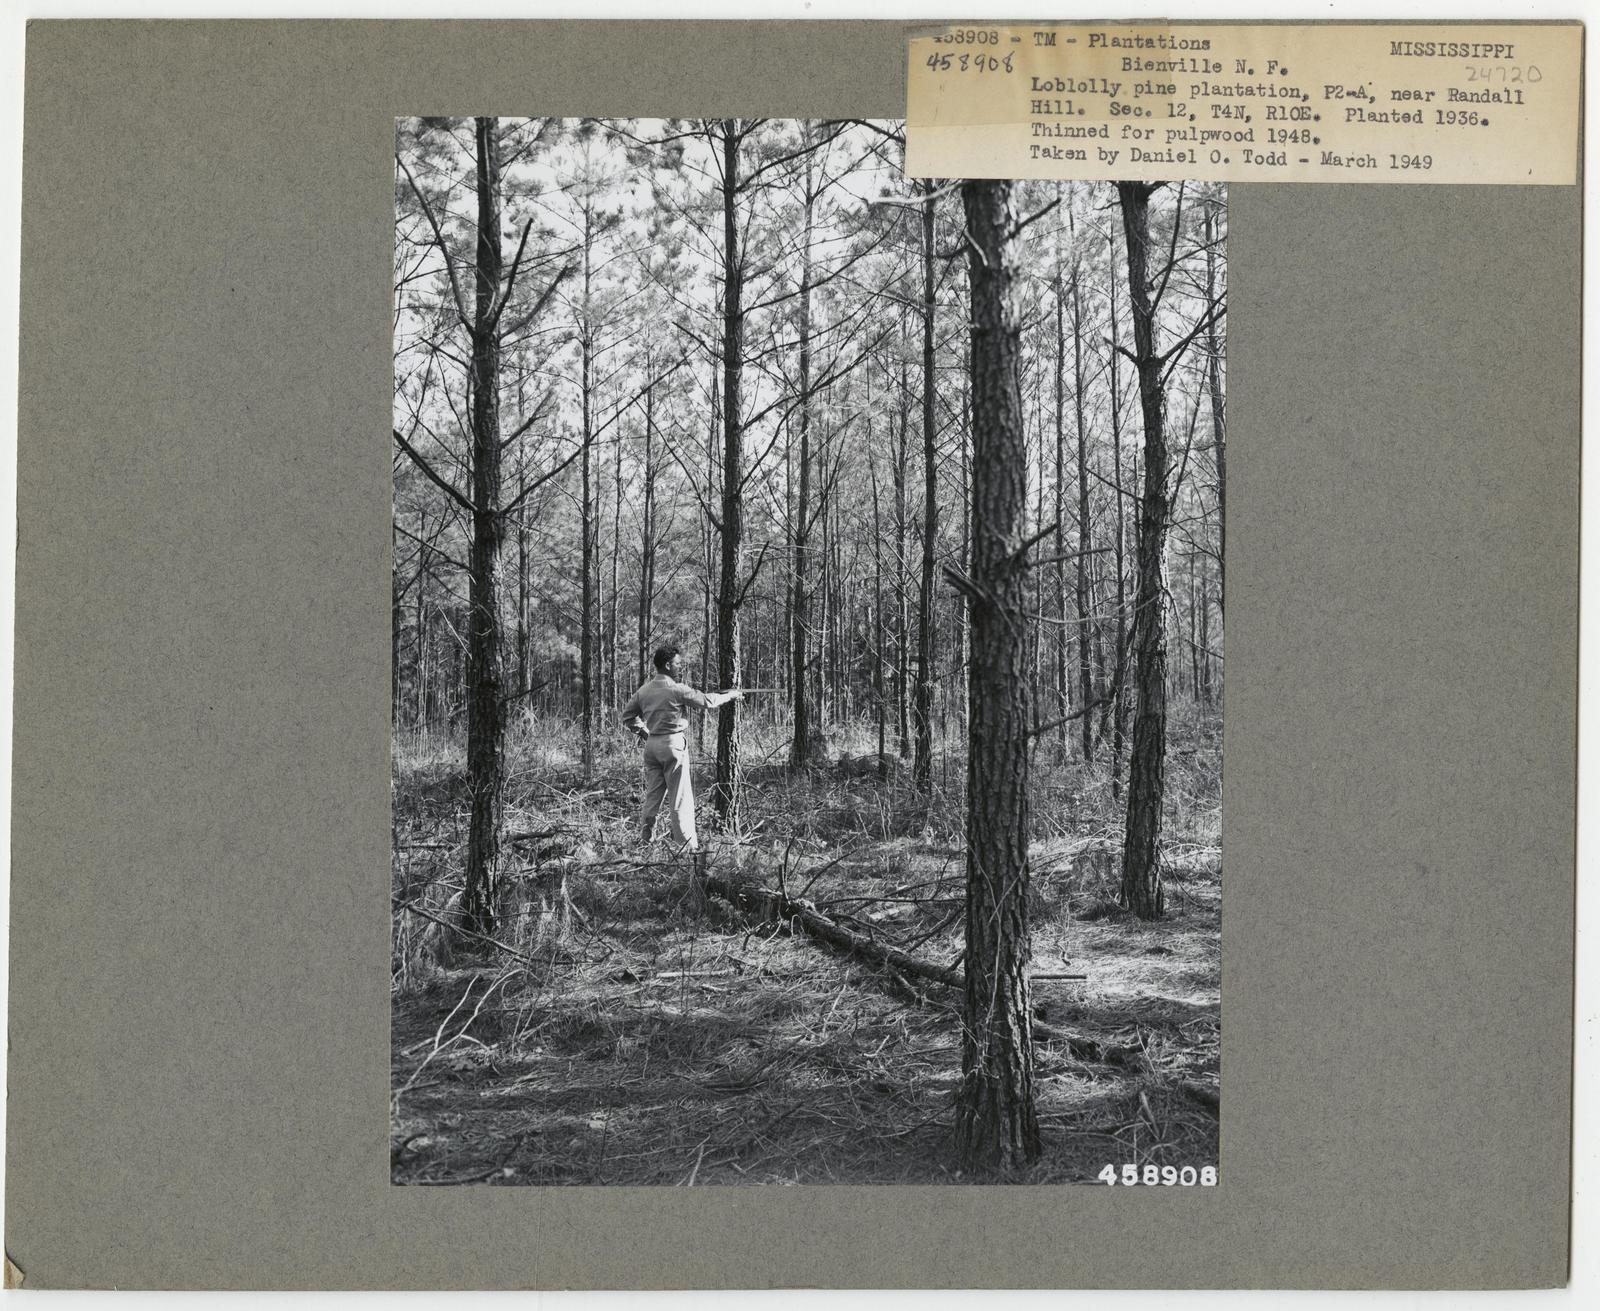 Reforestation: Plantations - Mississippi